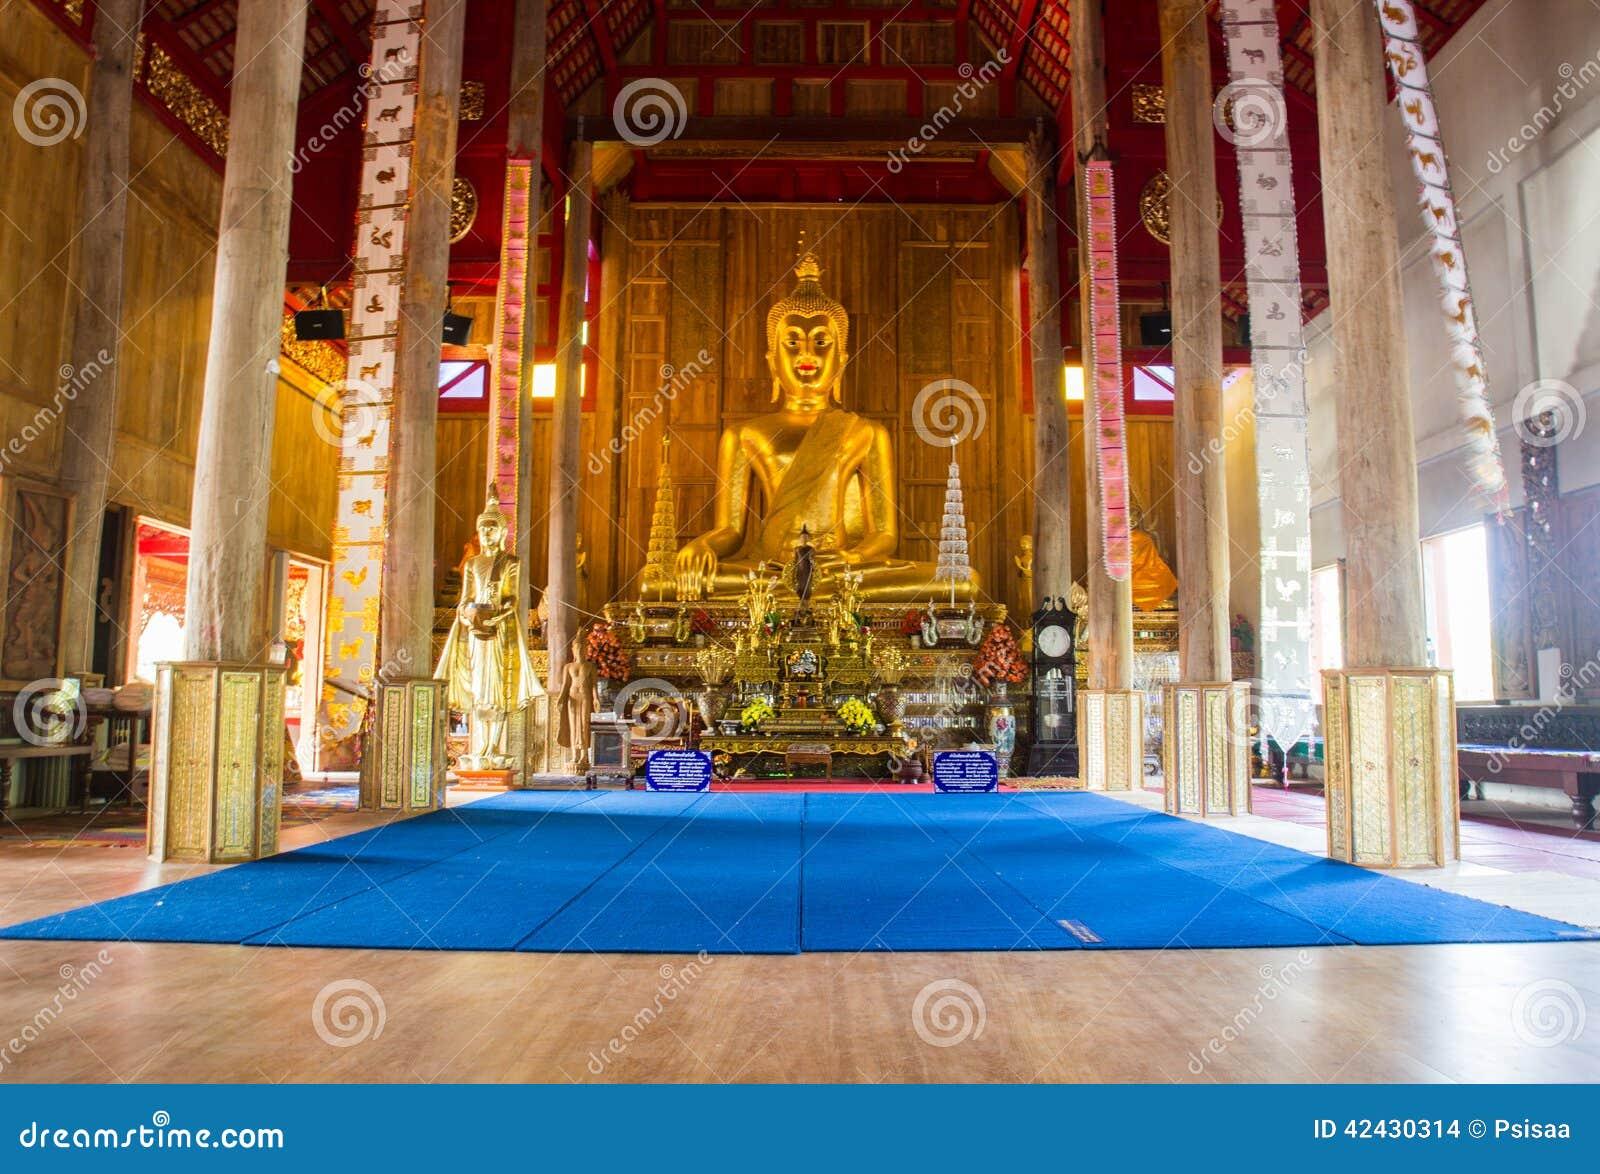 Estatua de oro de Buda en iglesia